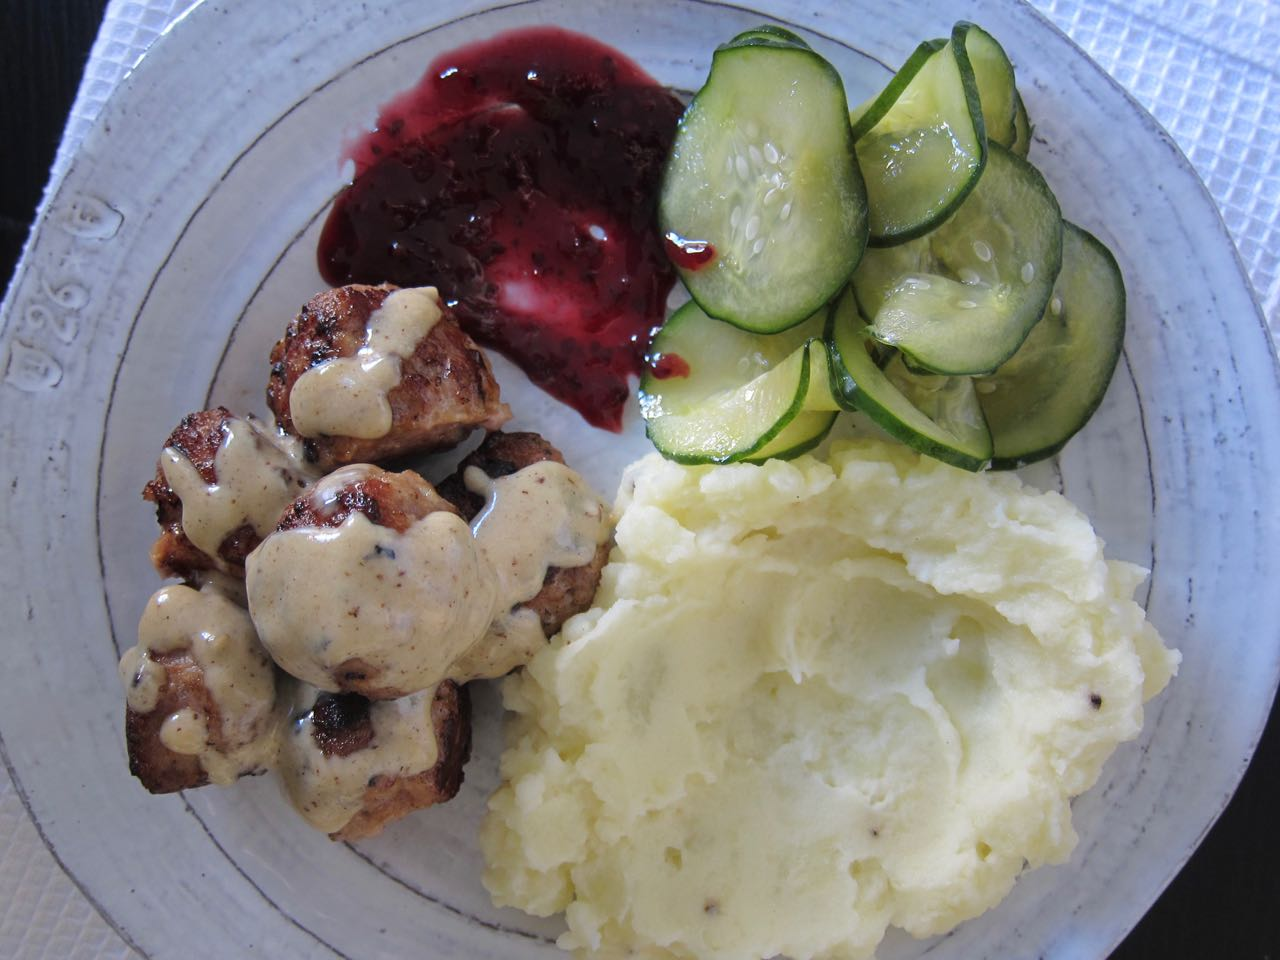 swedish meatballs and potato mash